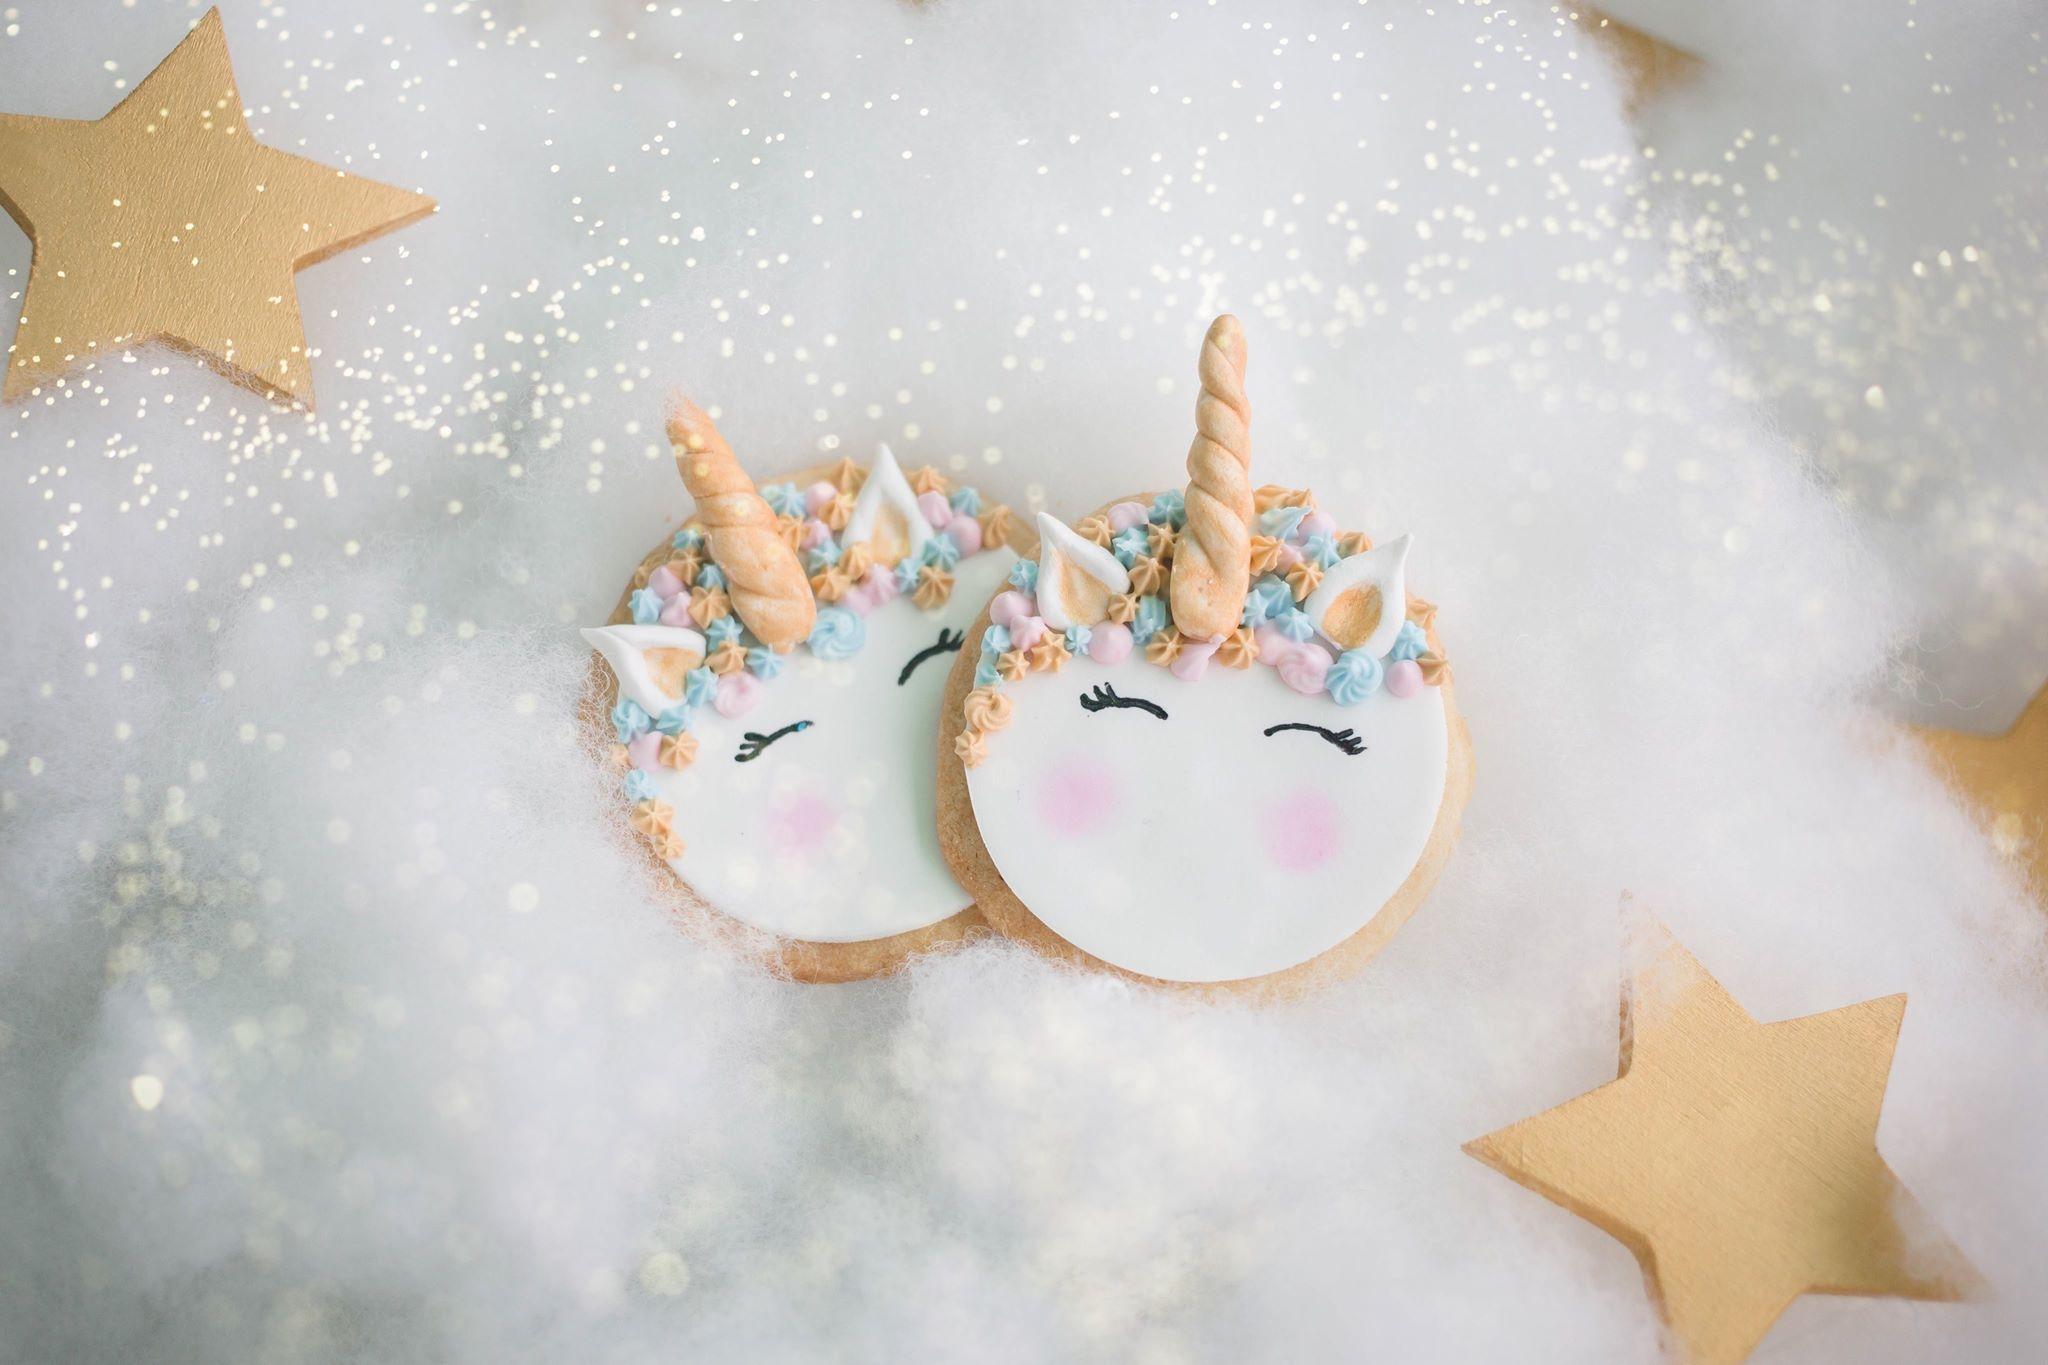 Einhorncookies